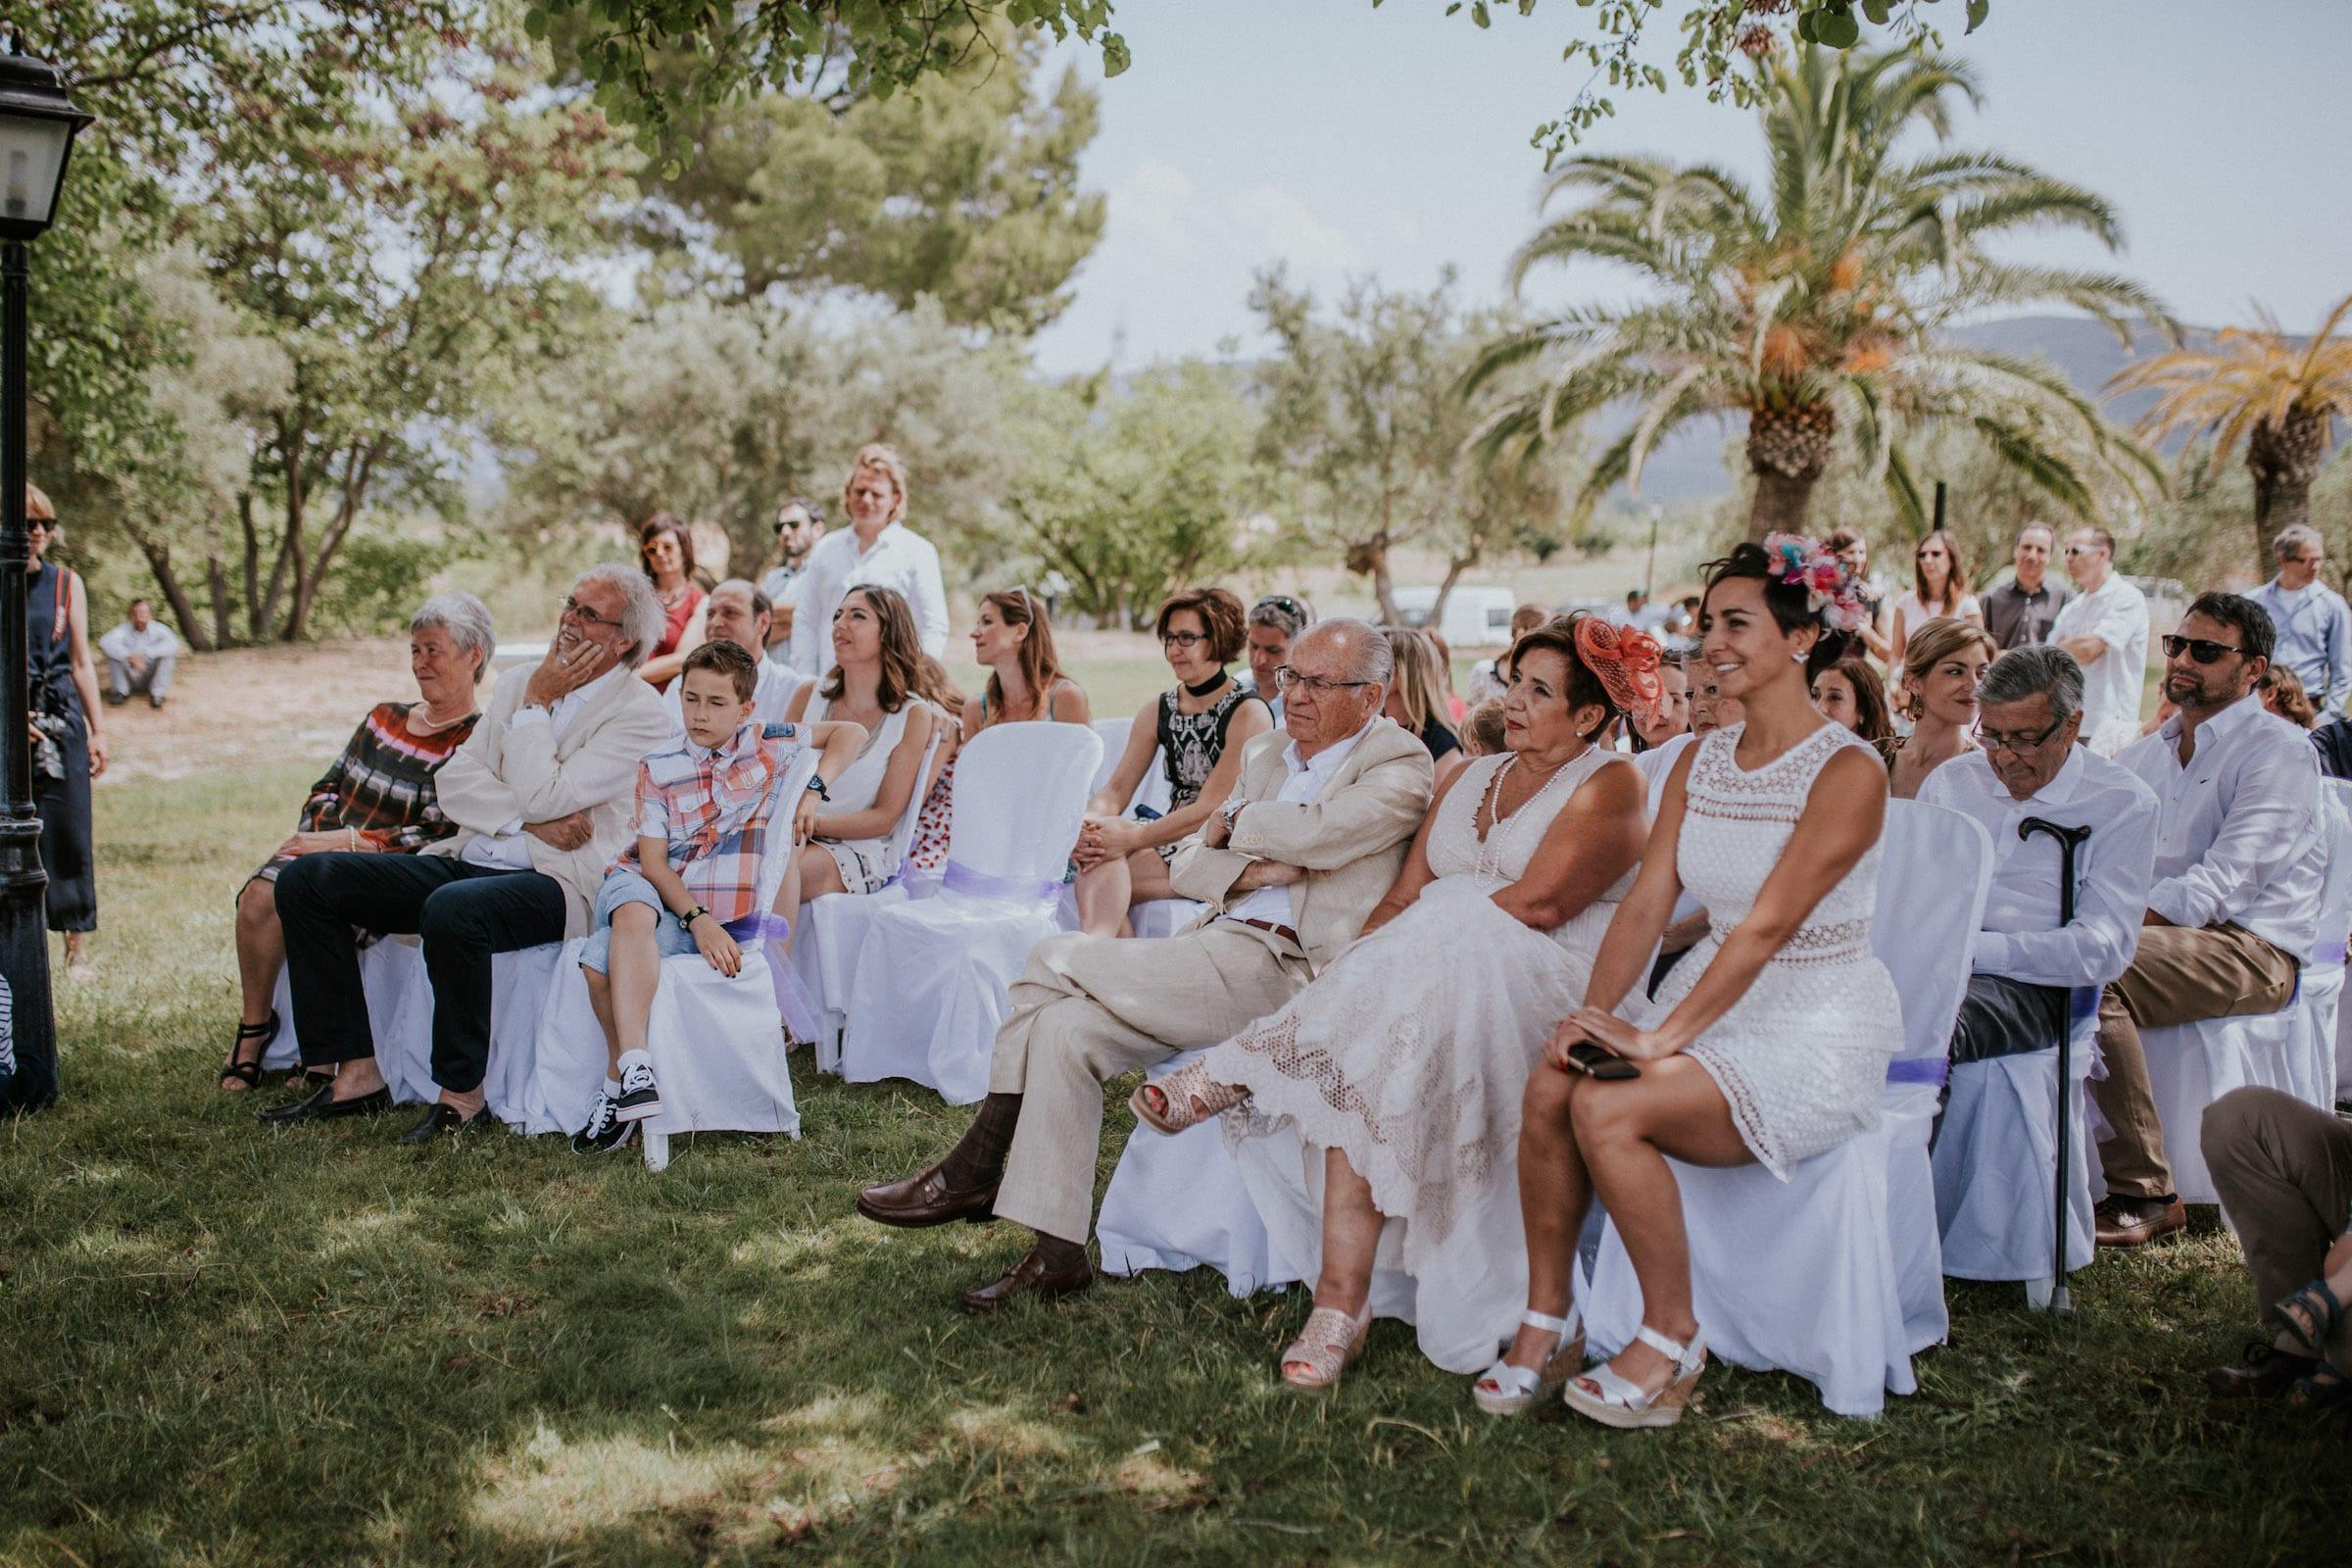 093+wedding+in+valencia+weddingphotographer.jpg